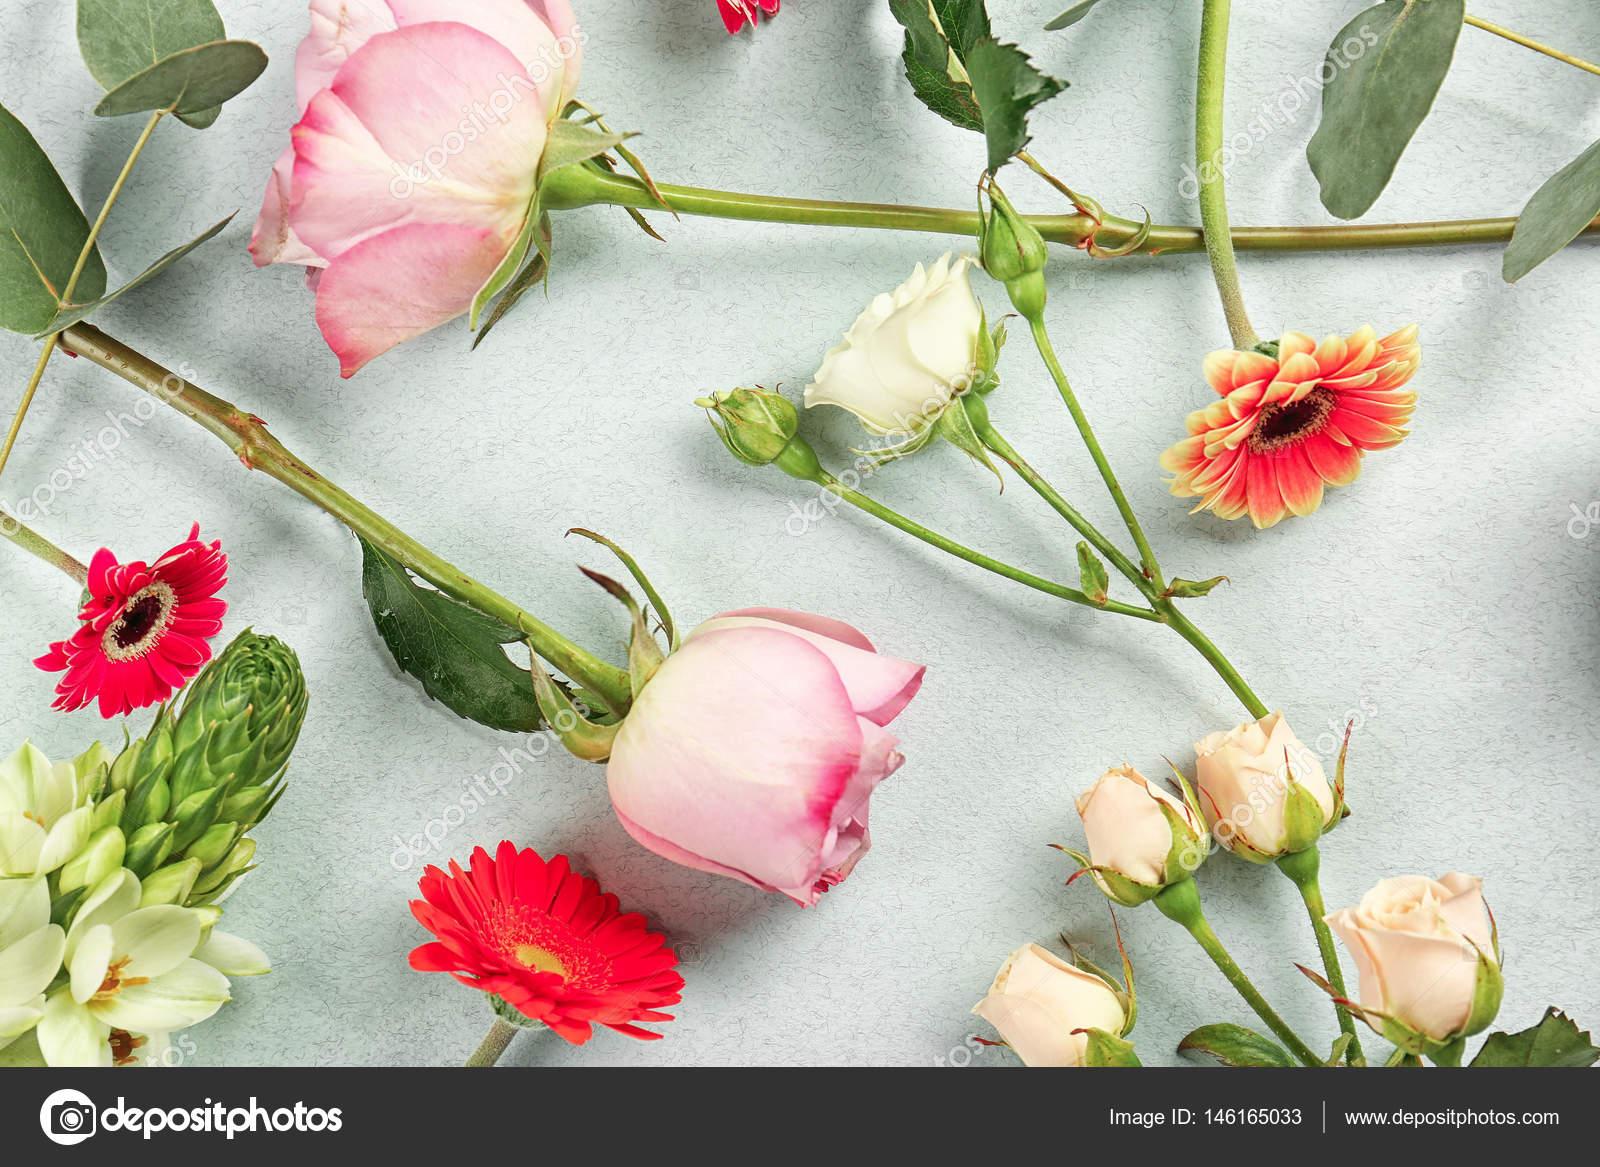 Beautiful fresh flowers stock photo belchonock 146165033 beautiful fresh flowers on color background photo by belchonock izmirmasajfo Gallery